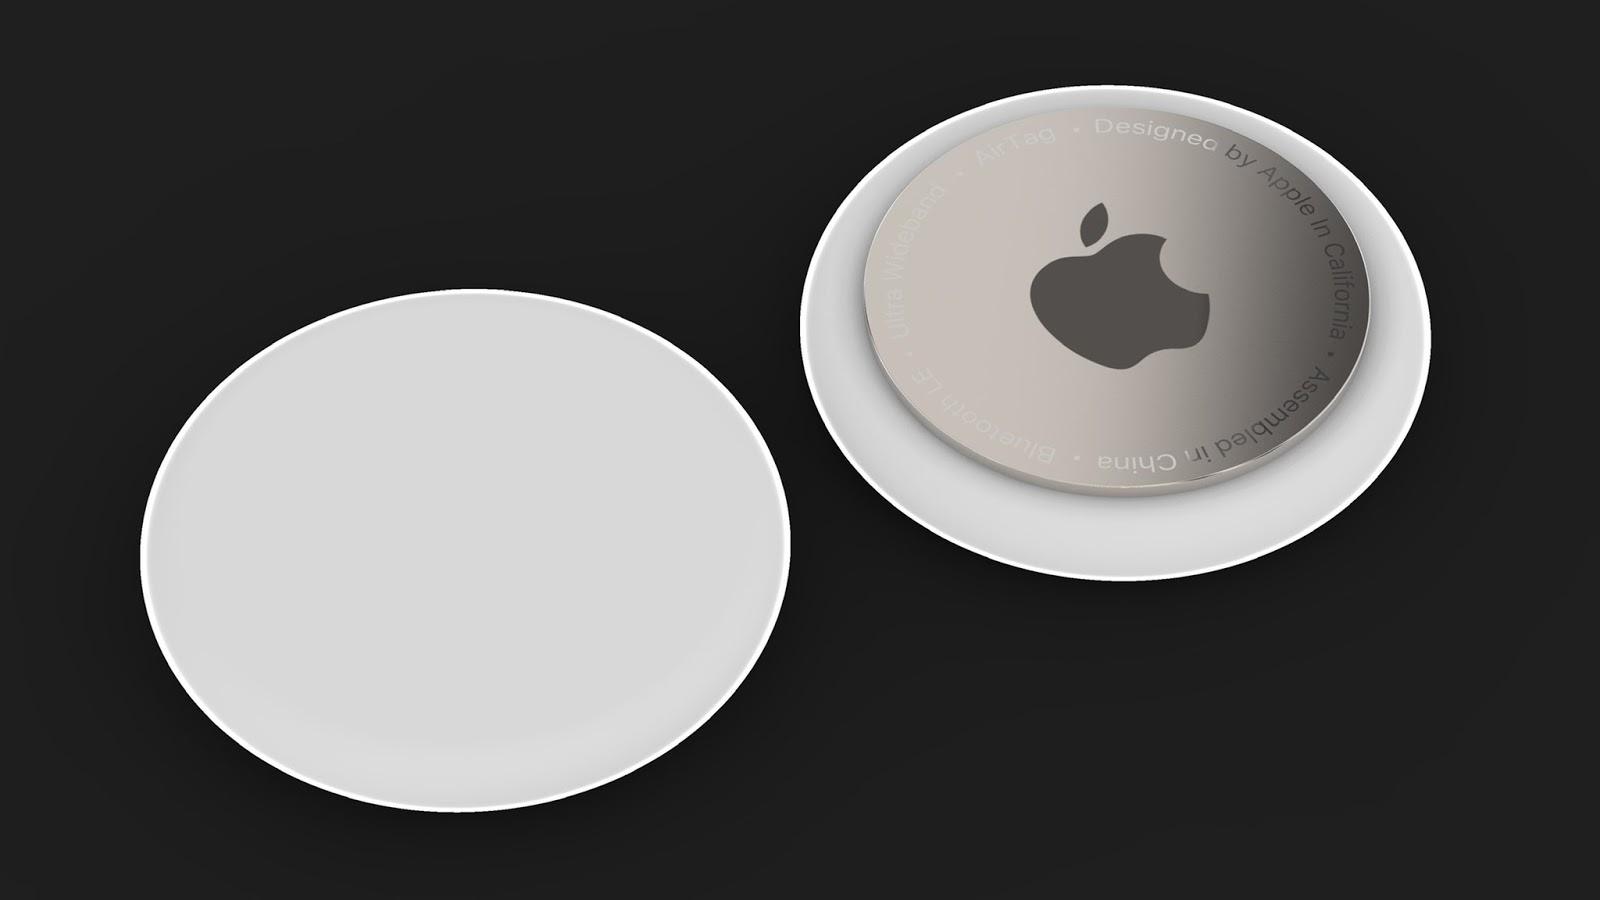 Дороже Samsung Galaxy SmartTag: сколько будут стоить Bluetooth-трекеры Apple AirTag